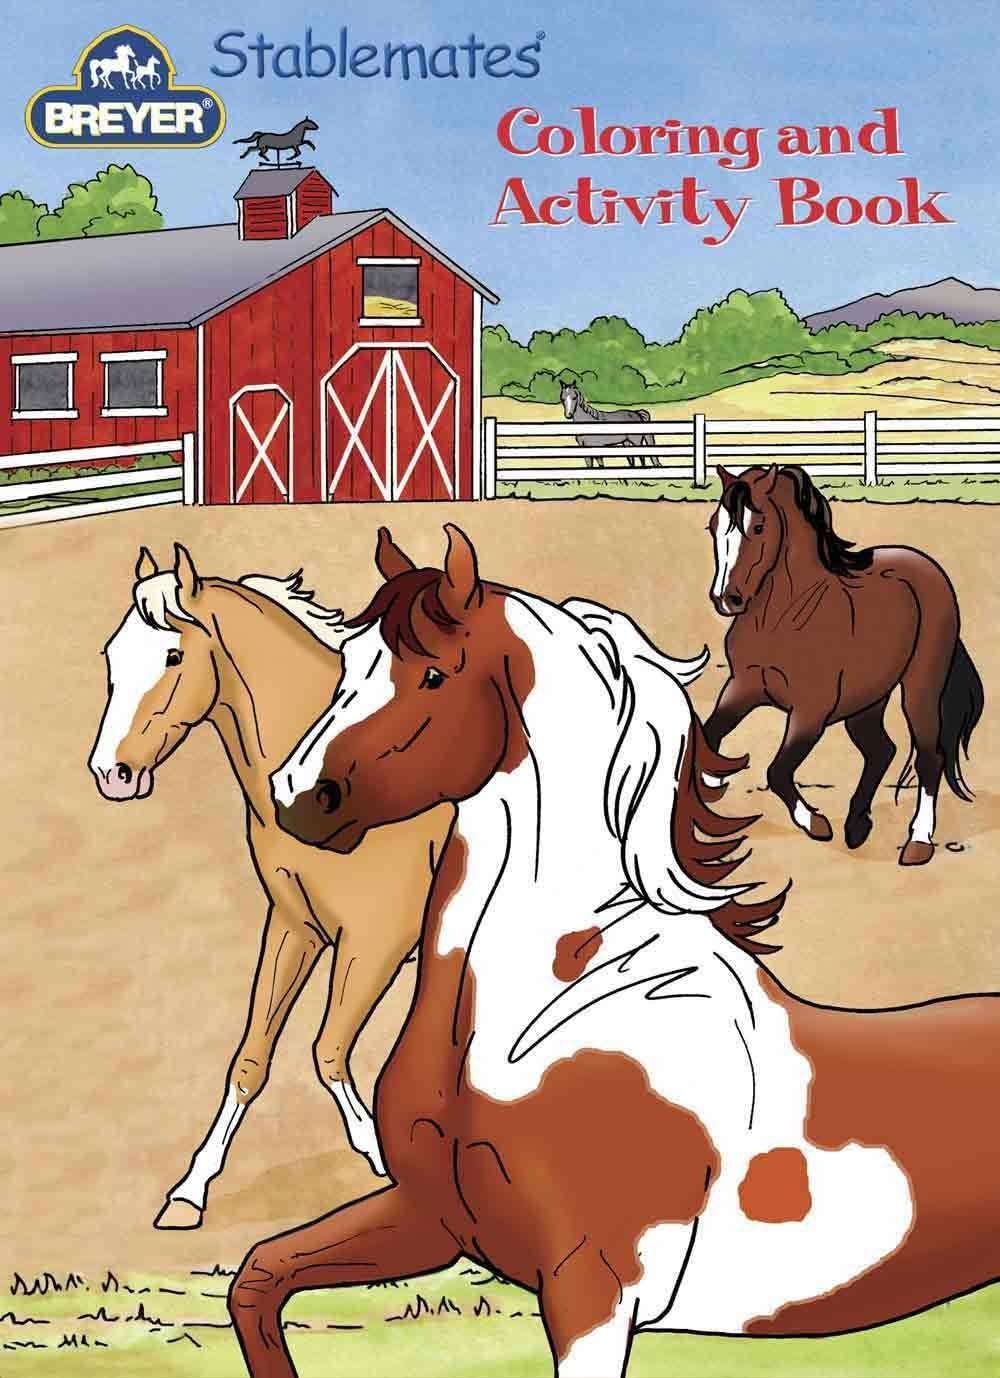 B00183S58W Breyer Stablemates Coloring & Activity Book 711gJADoceL